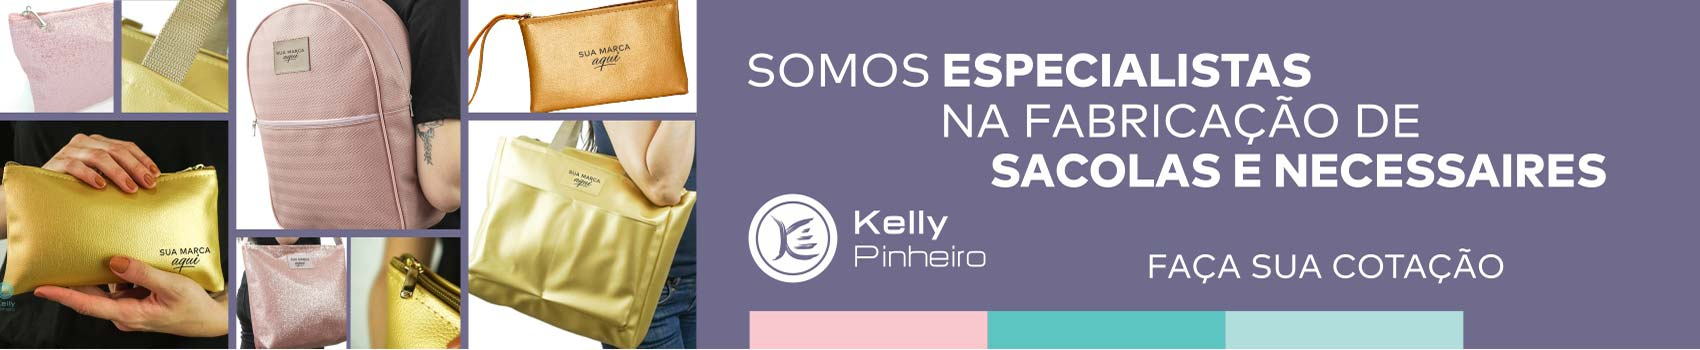 Kelly Pinheiro Brindes